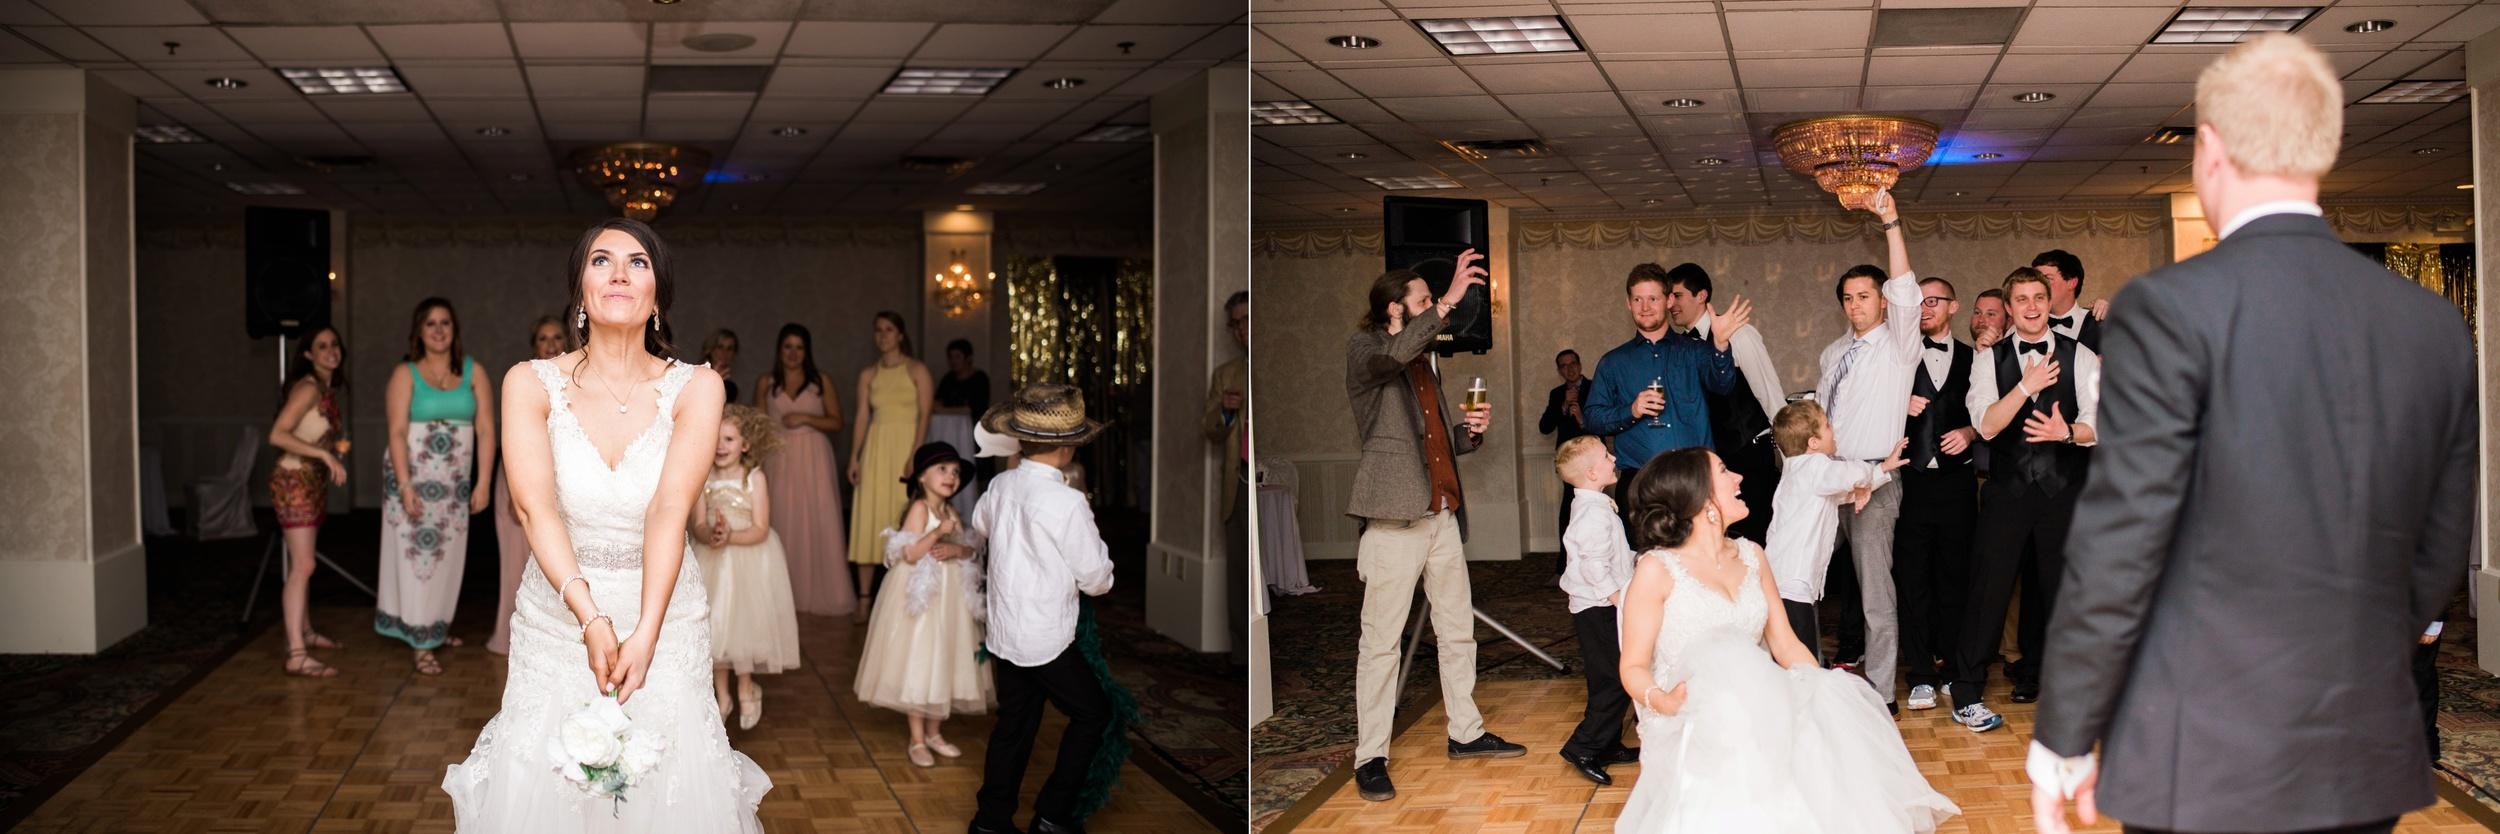 Downtown Des Moines Wedding Photographer_2148.jpg